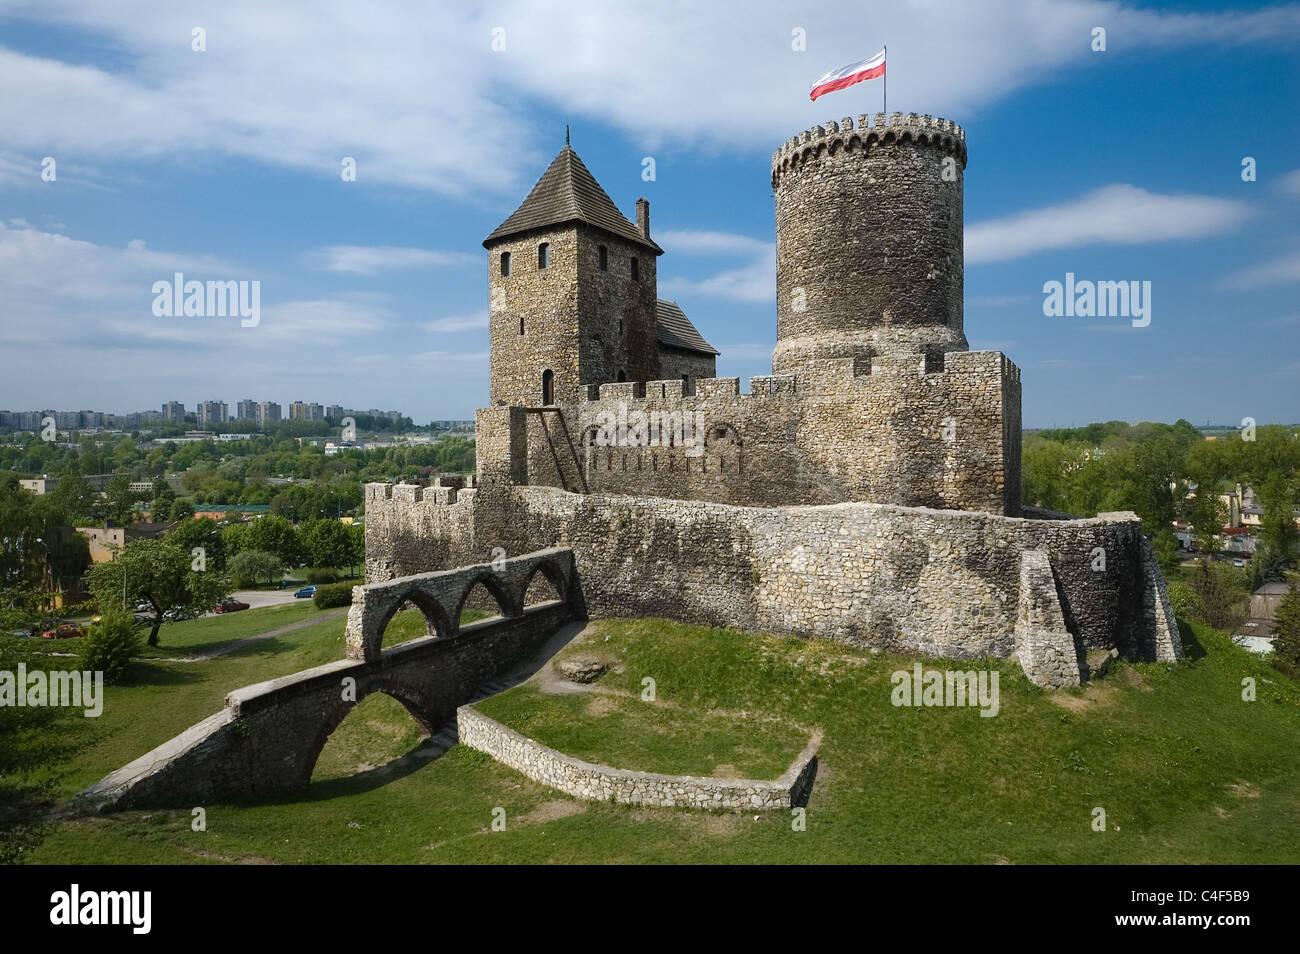 The medieval castle in Bedzin, Silesia, Poland Stock Photo